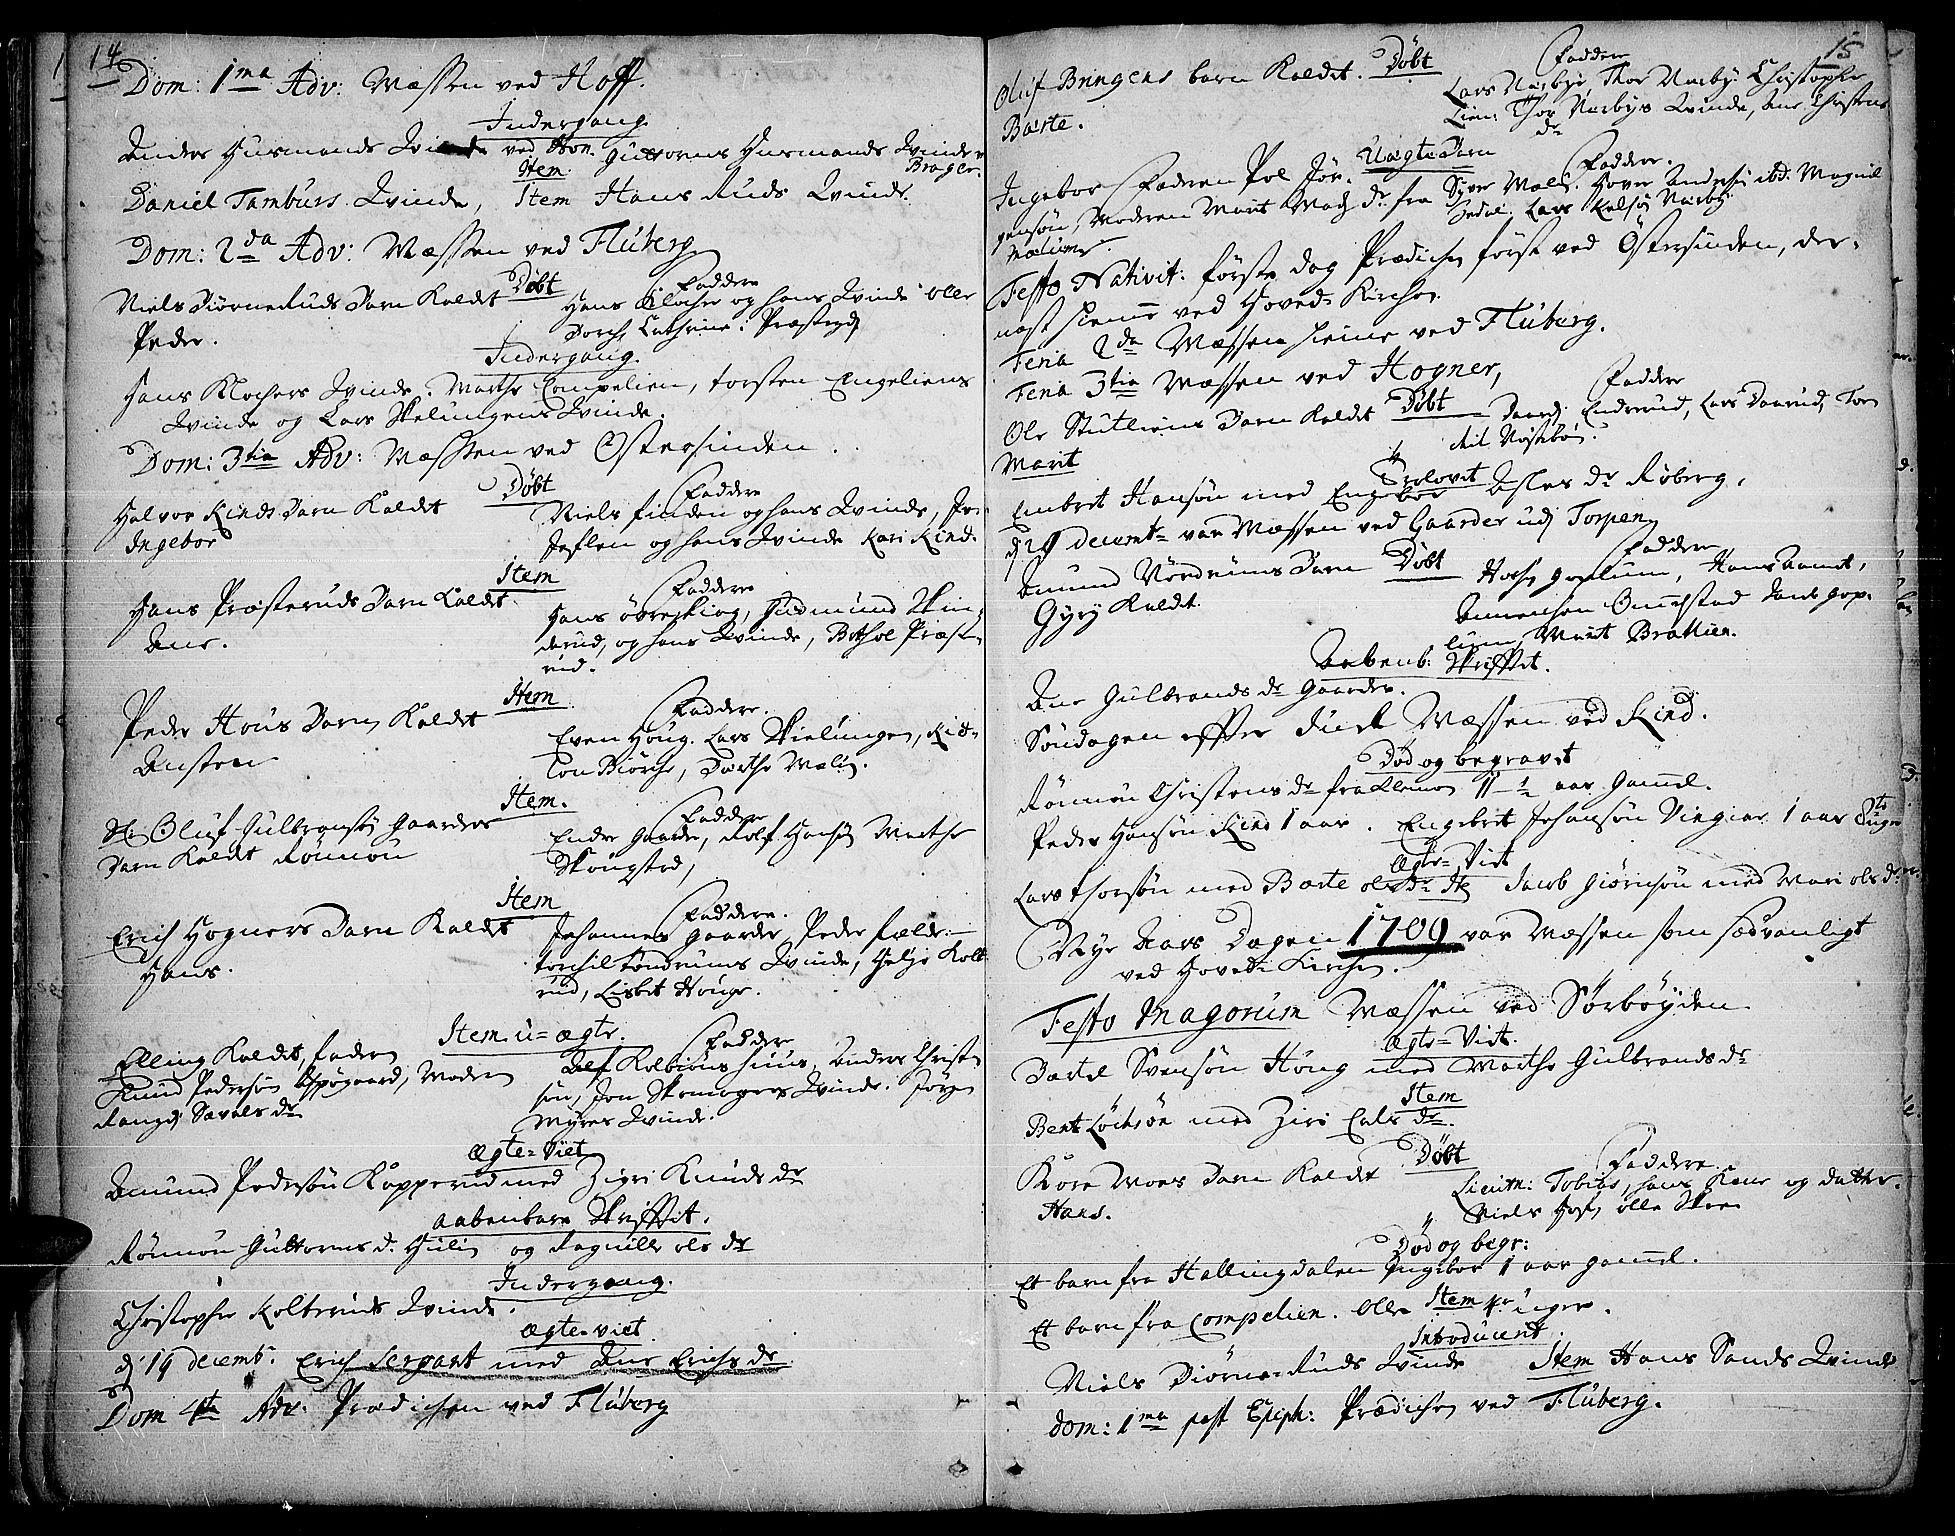 SAH, Land prestekontor, Ministerialbok nr. 1, 1708-1732, s. 14-15